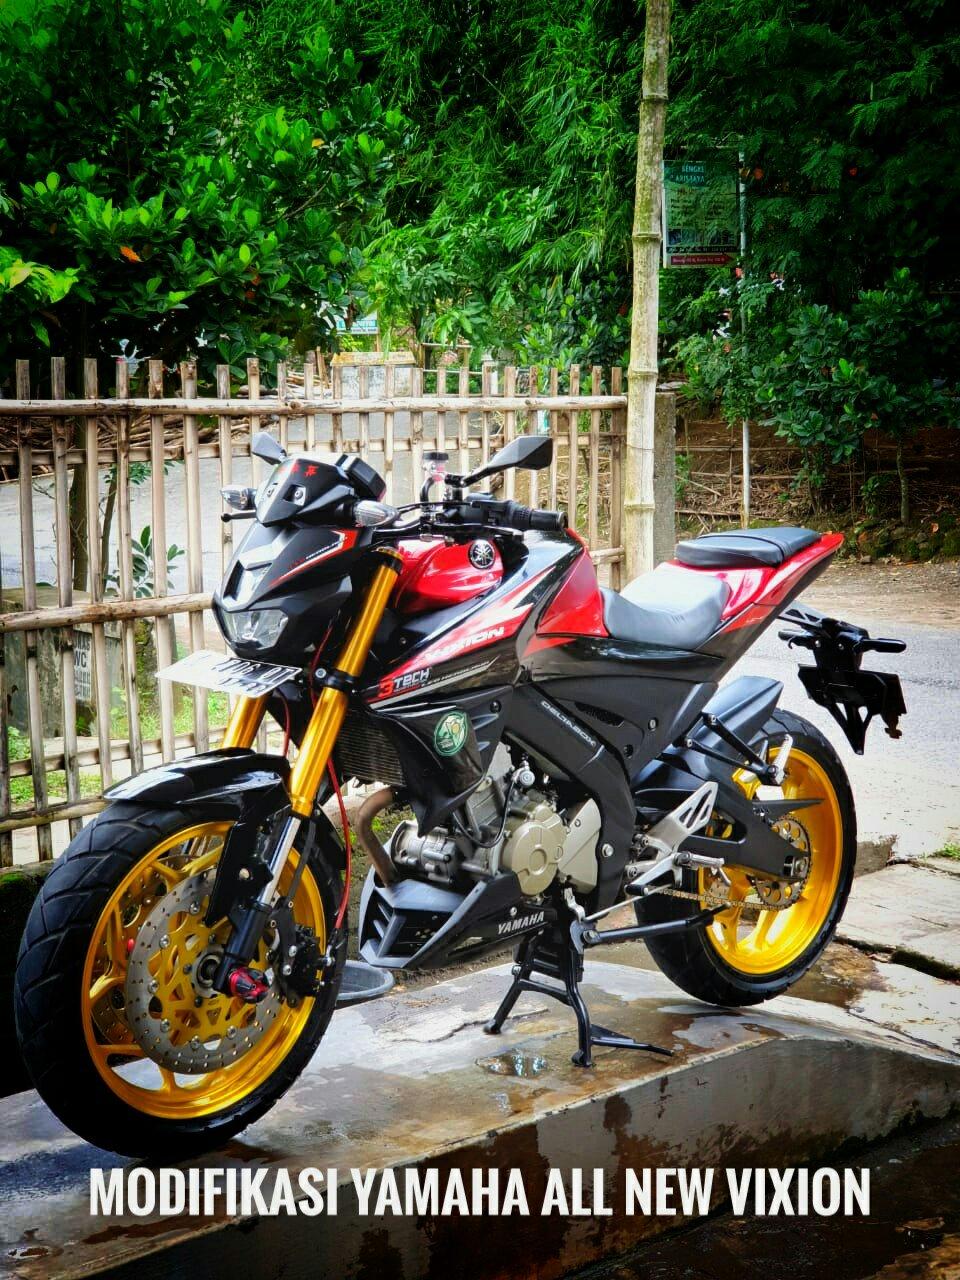 Modifikasi Yamaha All New Vixion Bro Viki Standrt Sporty